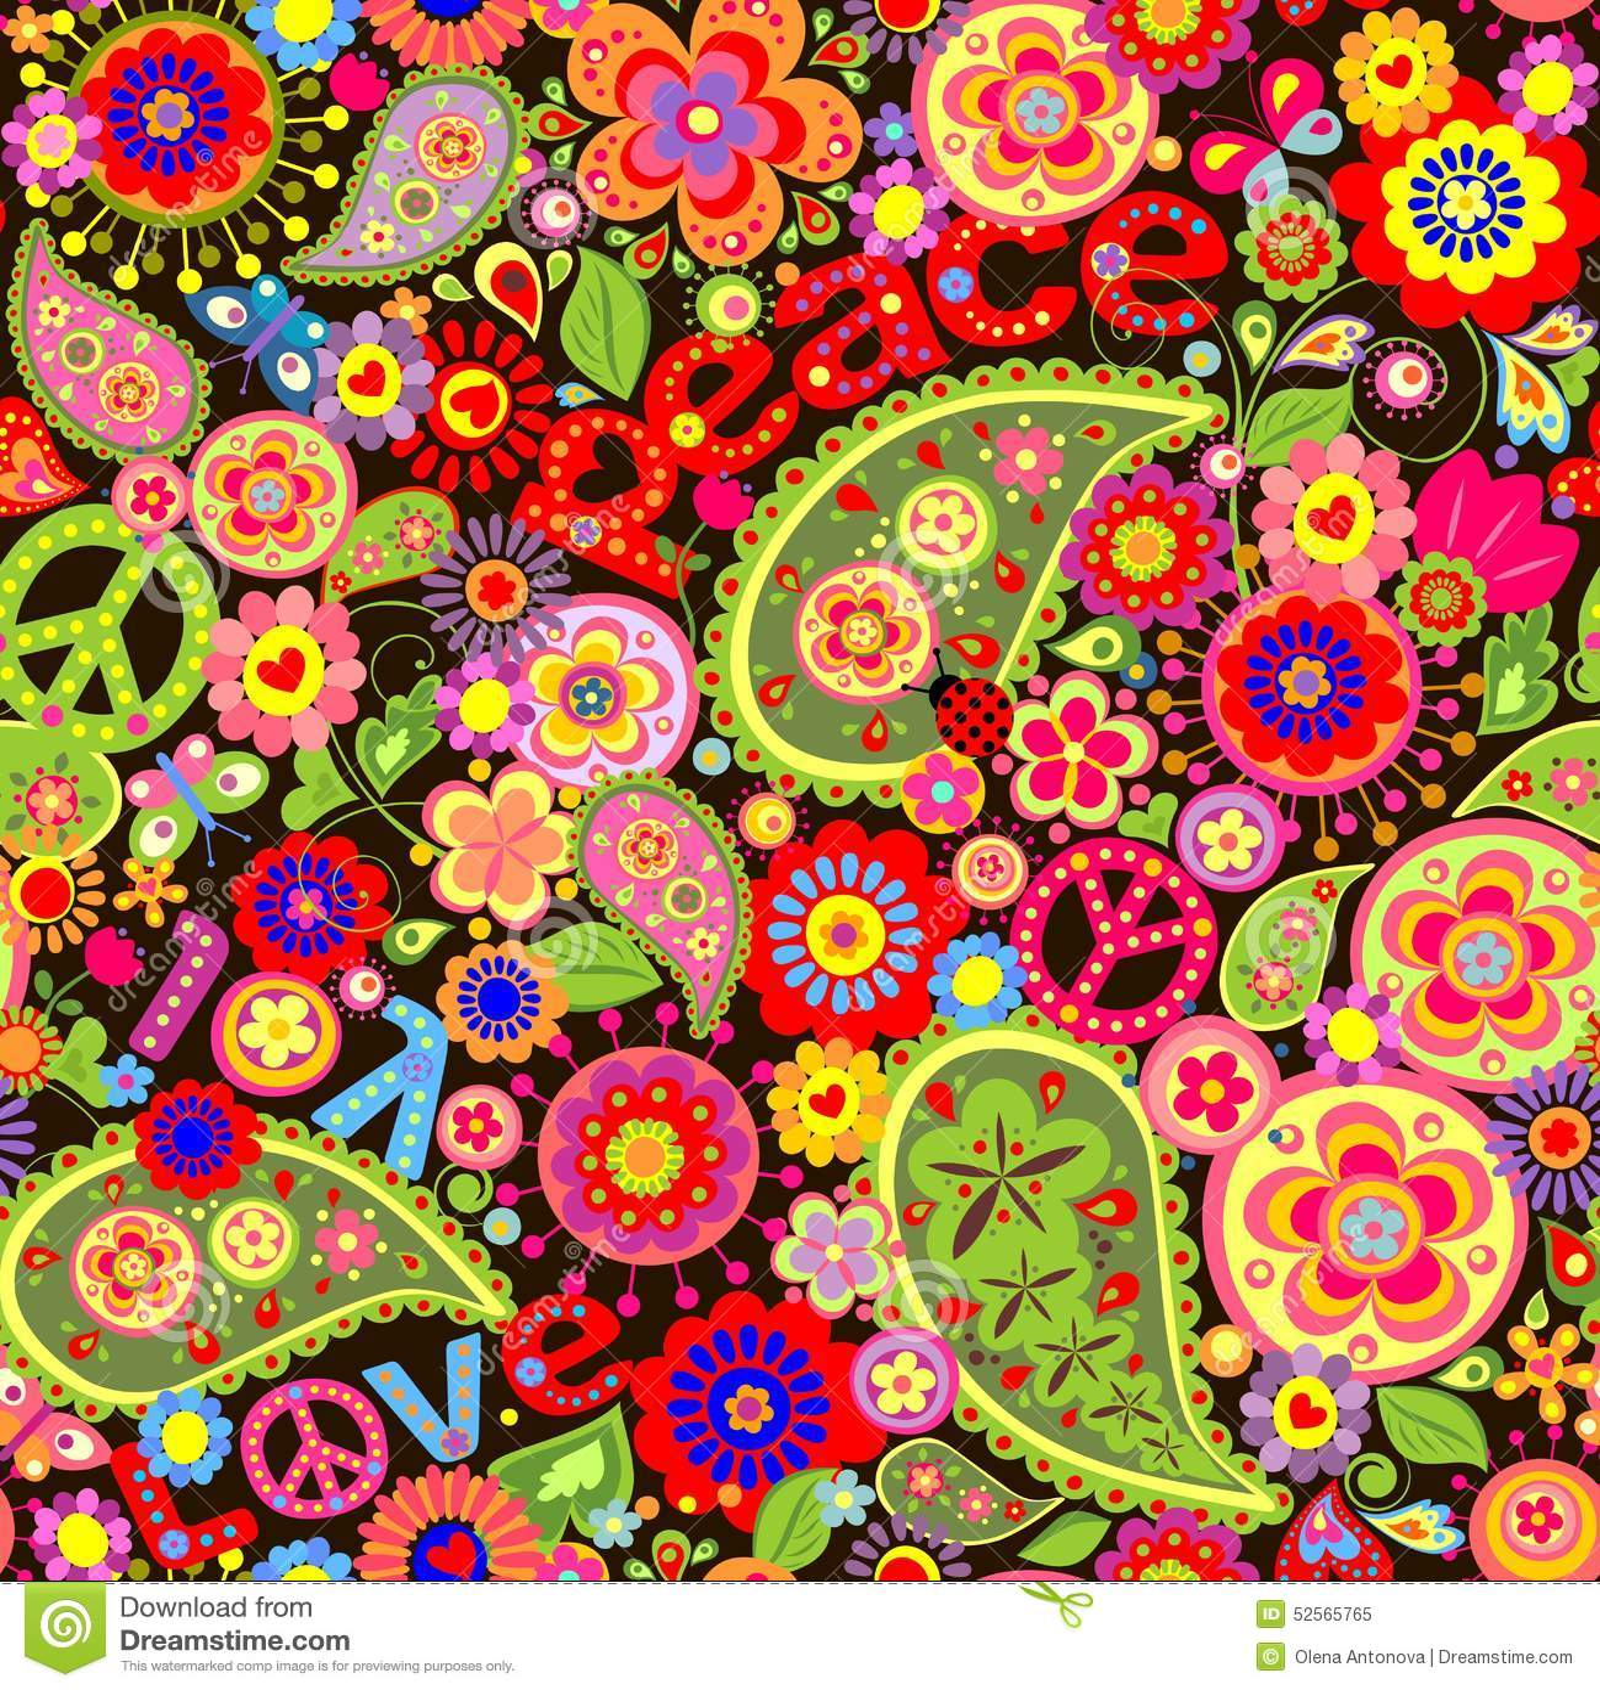 Groovy Flower Power Wallpaper